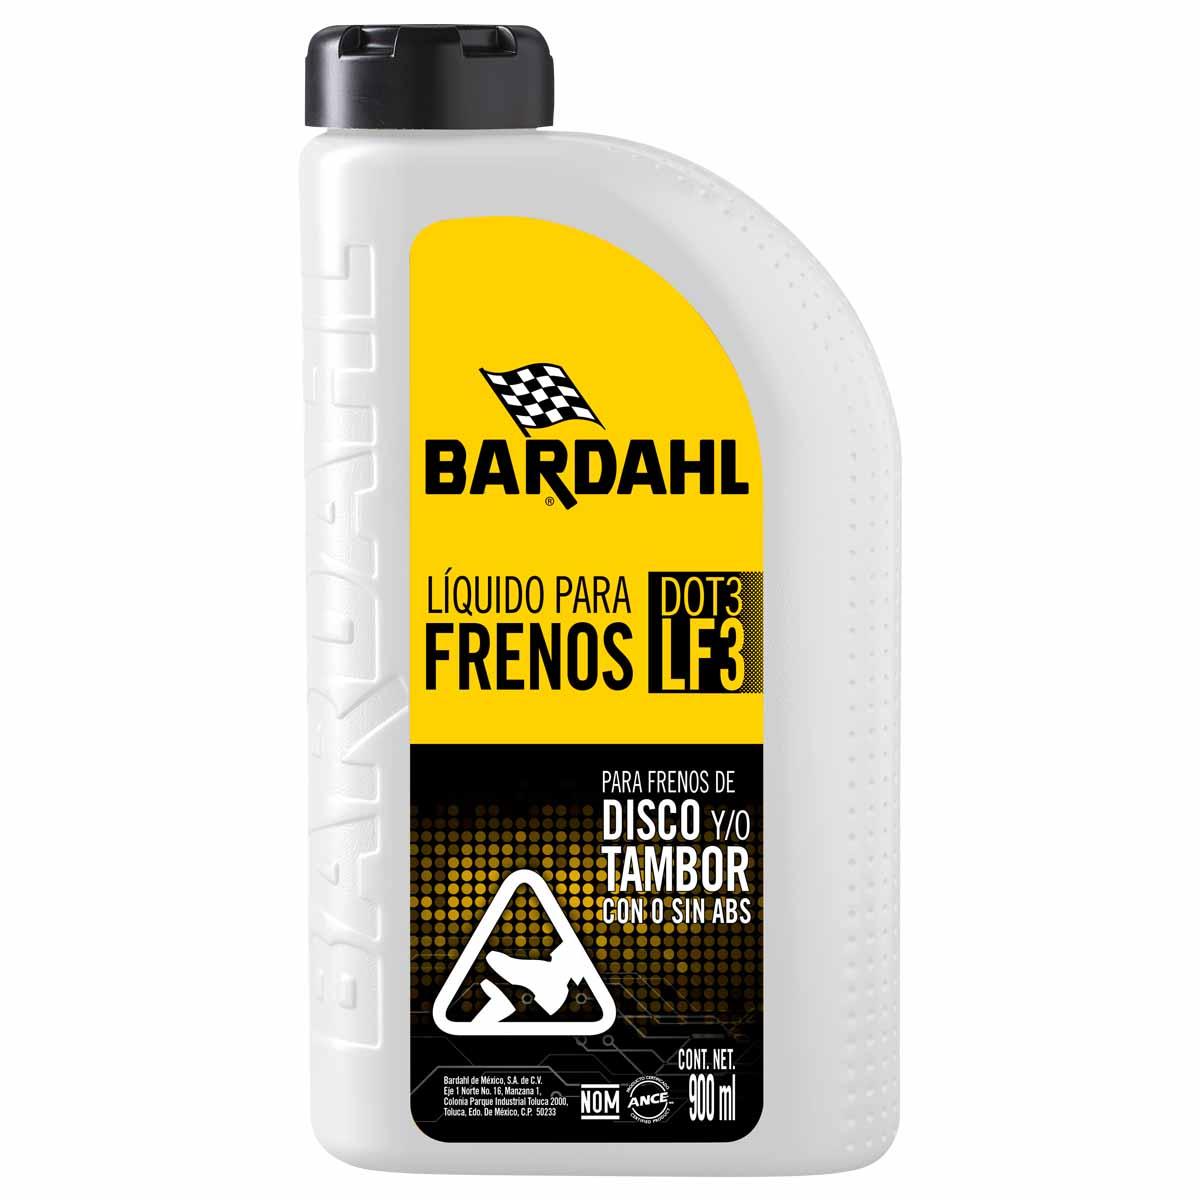 Liquido Para Frenos Disco Y Tambor Bardahl Dot-3 350 Ml